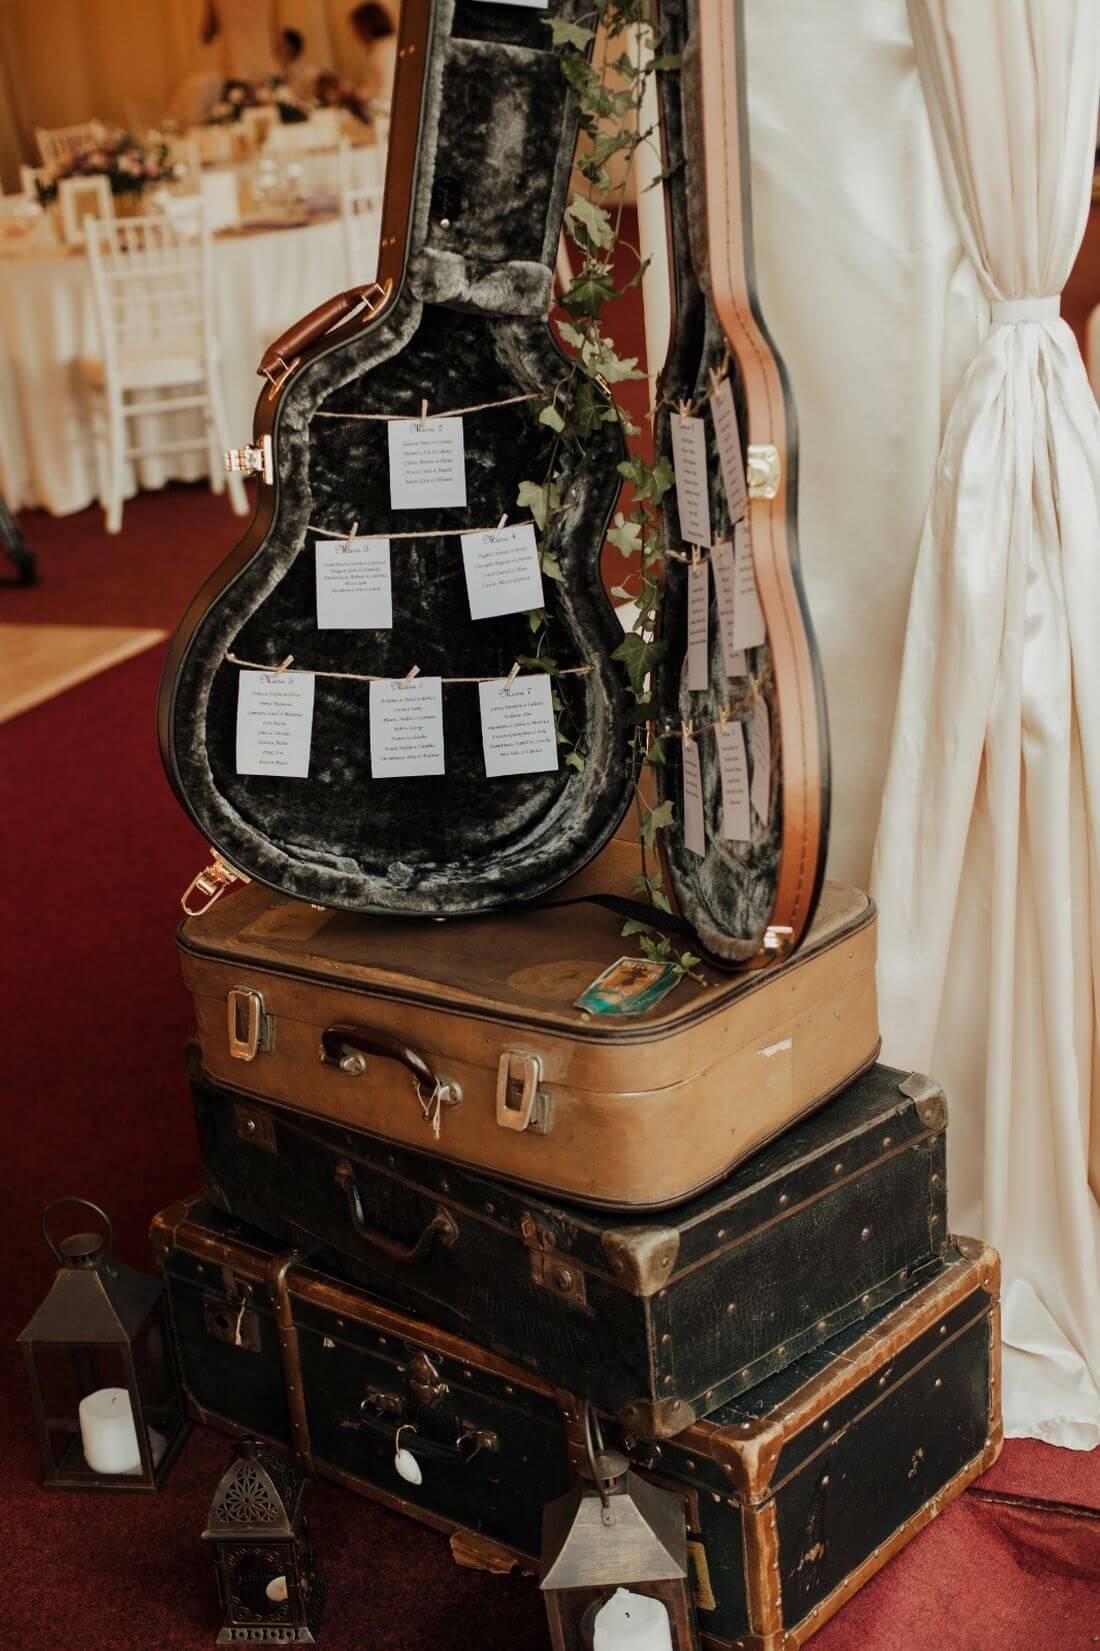 Nunta pe note muzicale – Ana-Maria si Robert – IDO-Weddings-nuntiinaerliber (5)